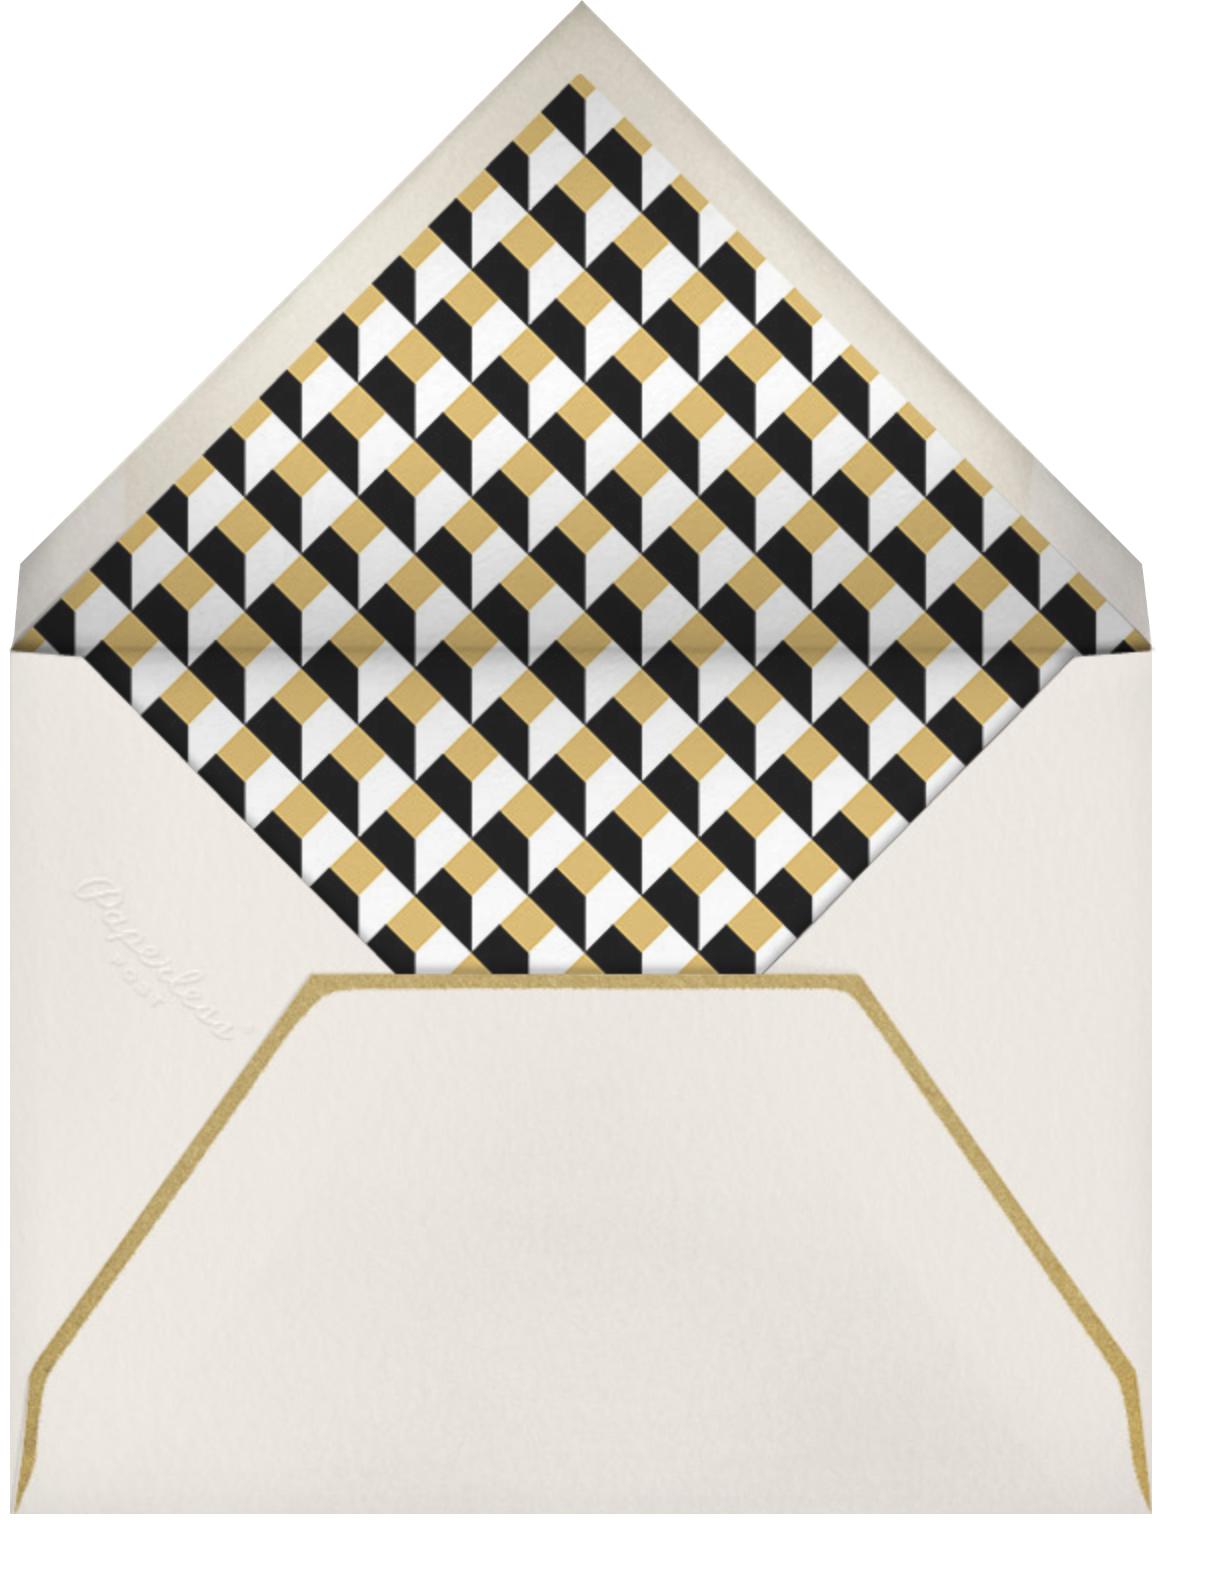 Leaf Inner Bevel Border - Cream Gold (Large Tall) - Paperless Post - Charity and fundraiser  - envelope back